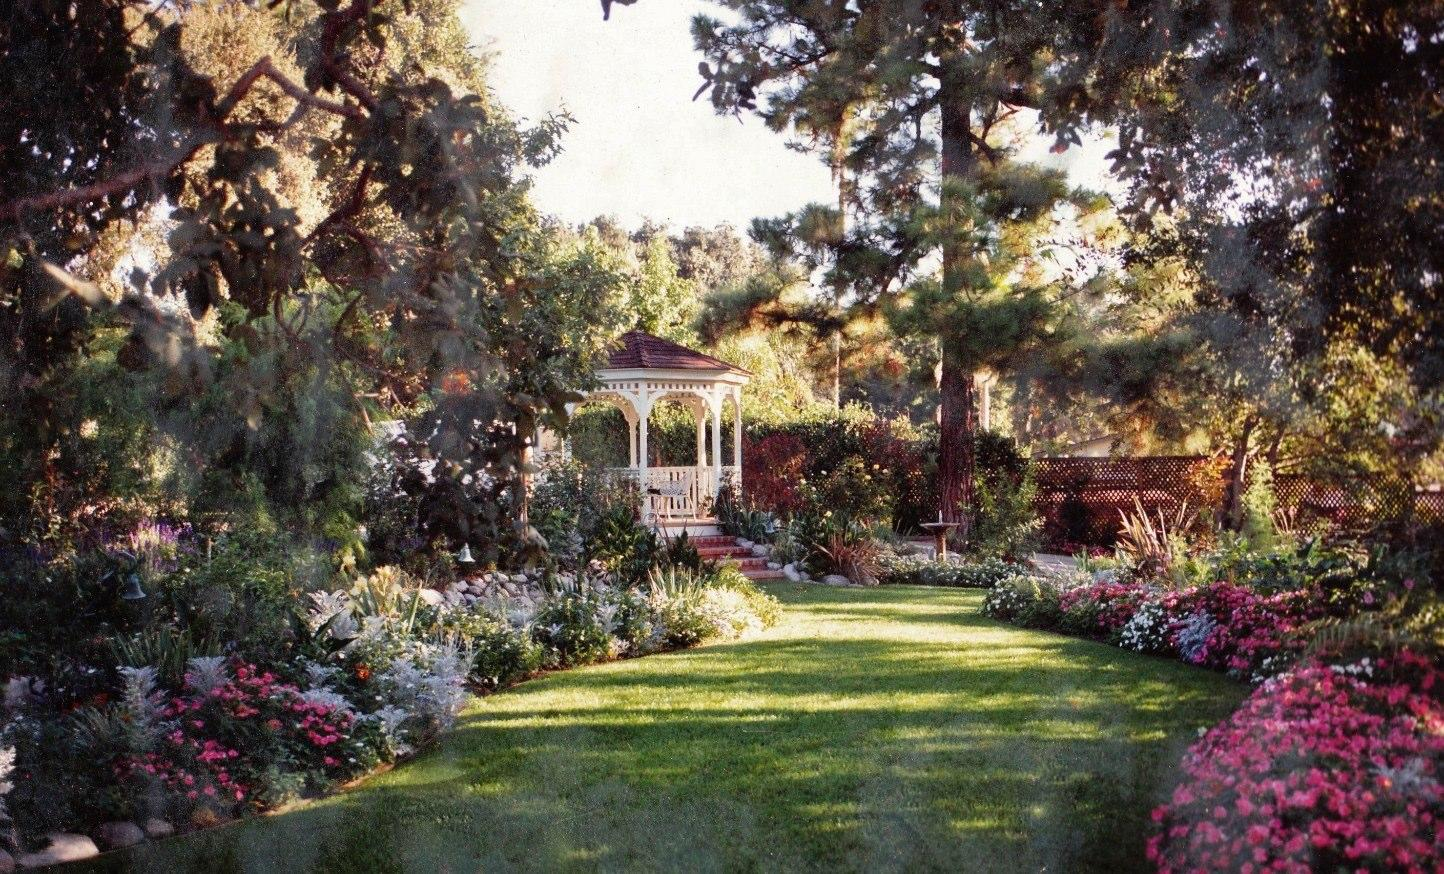 Walter Royal Fouts Landscaping Landscape Designers Monrovia California